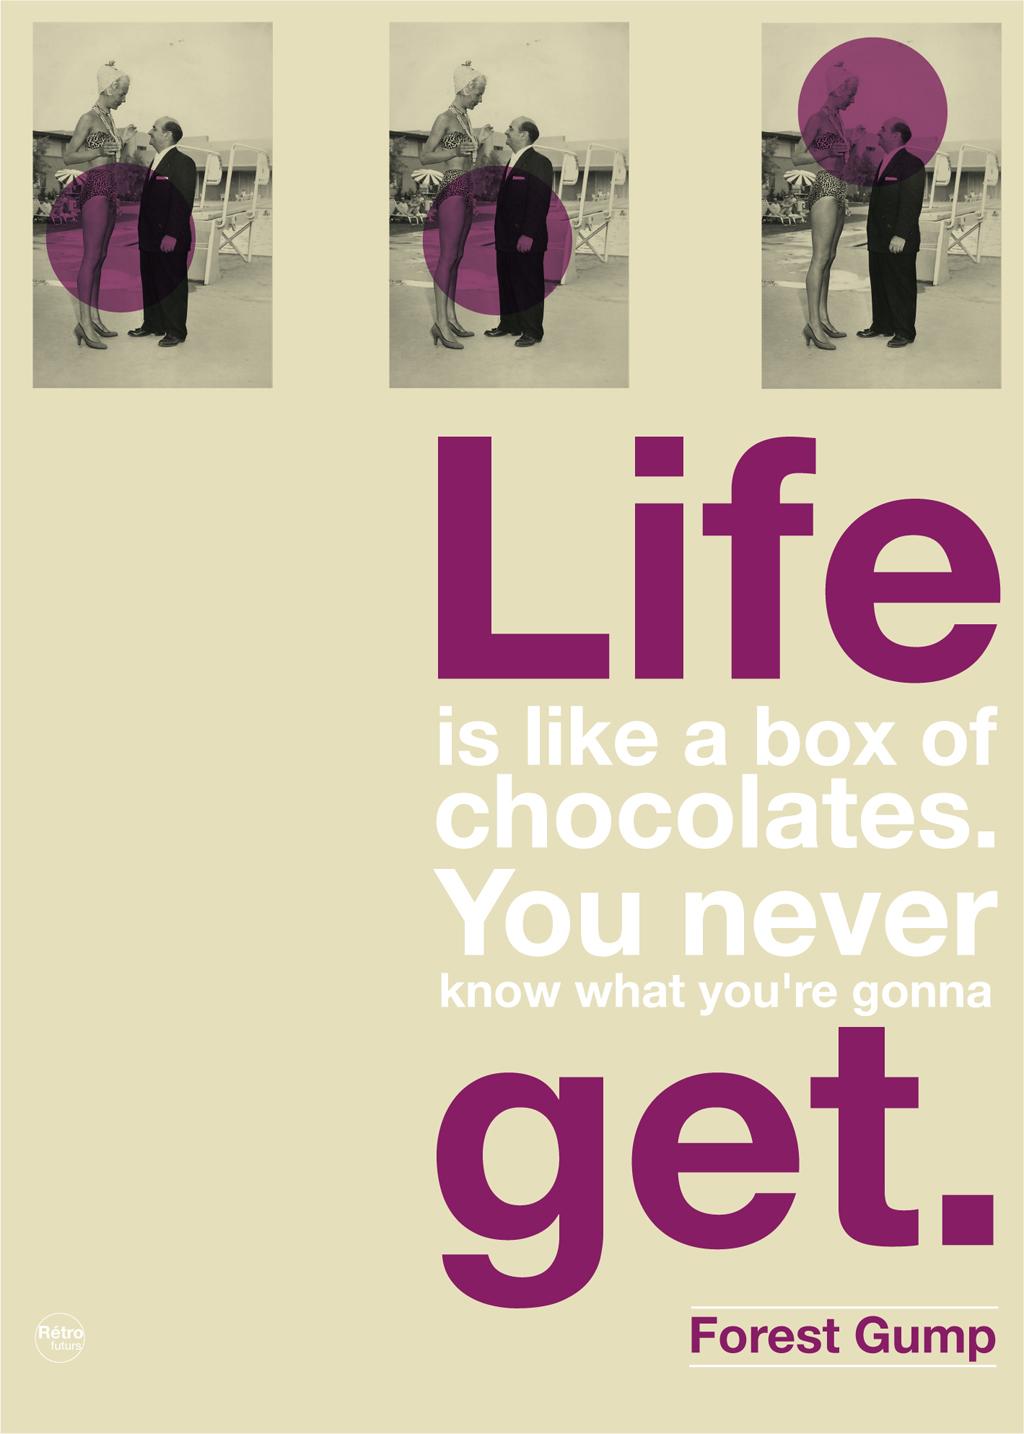 http://4.bp.blogspot.com/-CLvVN3UmEjo/T9cNVRyVFiI/AAAAAAAAAM8/CJD-iyoc290/s1600/Life_Quotes_inspirational.jpg